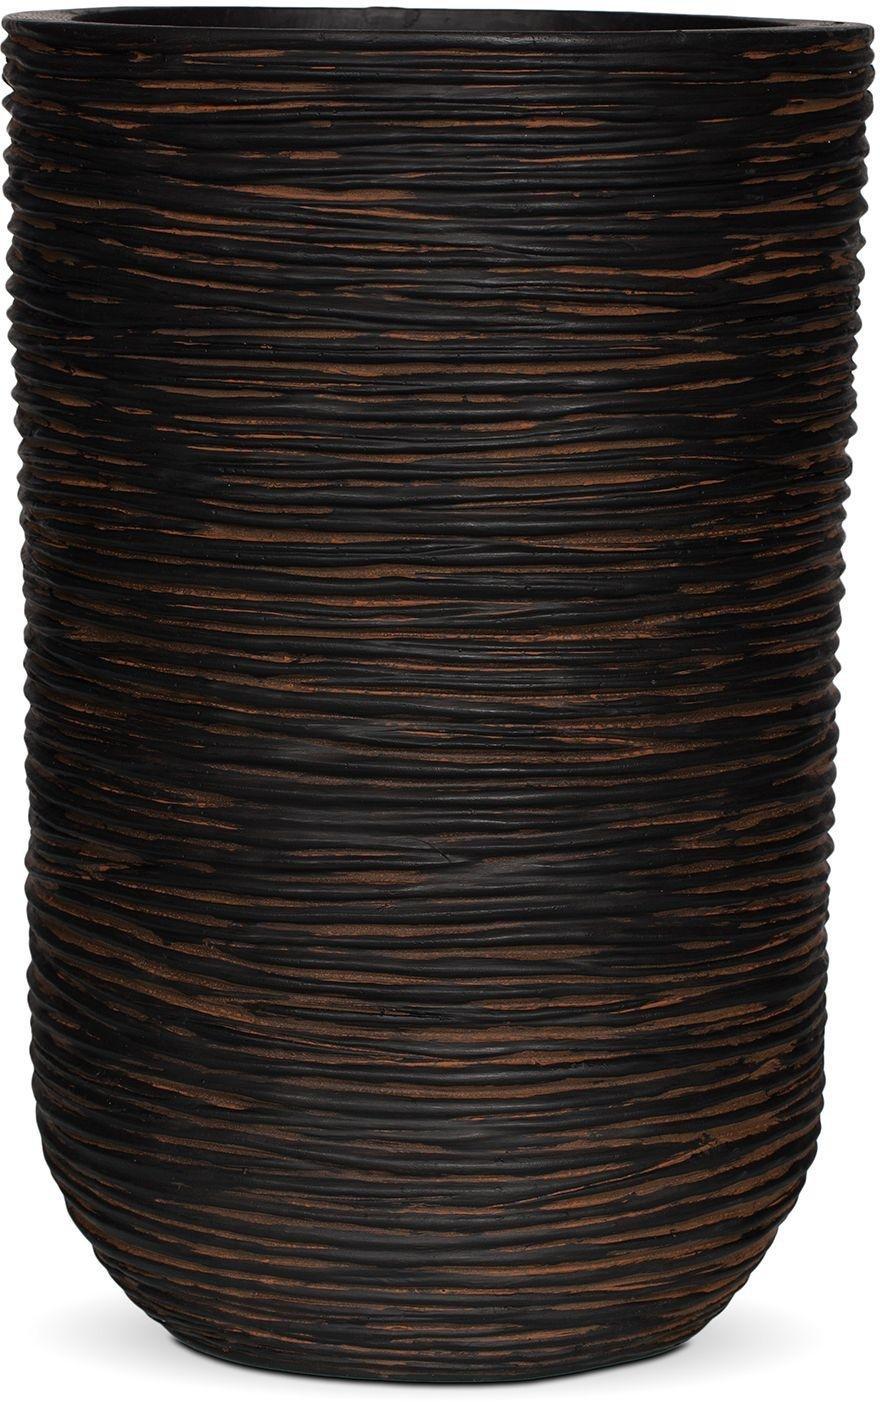 Capi Nature Brown Ribbed Cylinder Planter - 25 x 38cm.